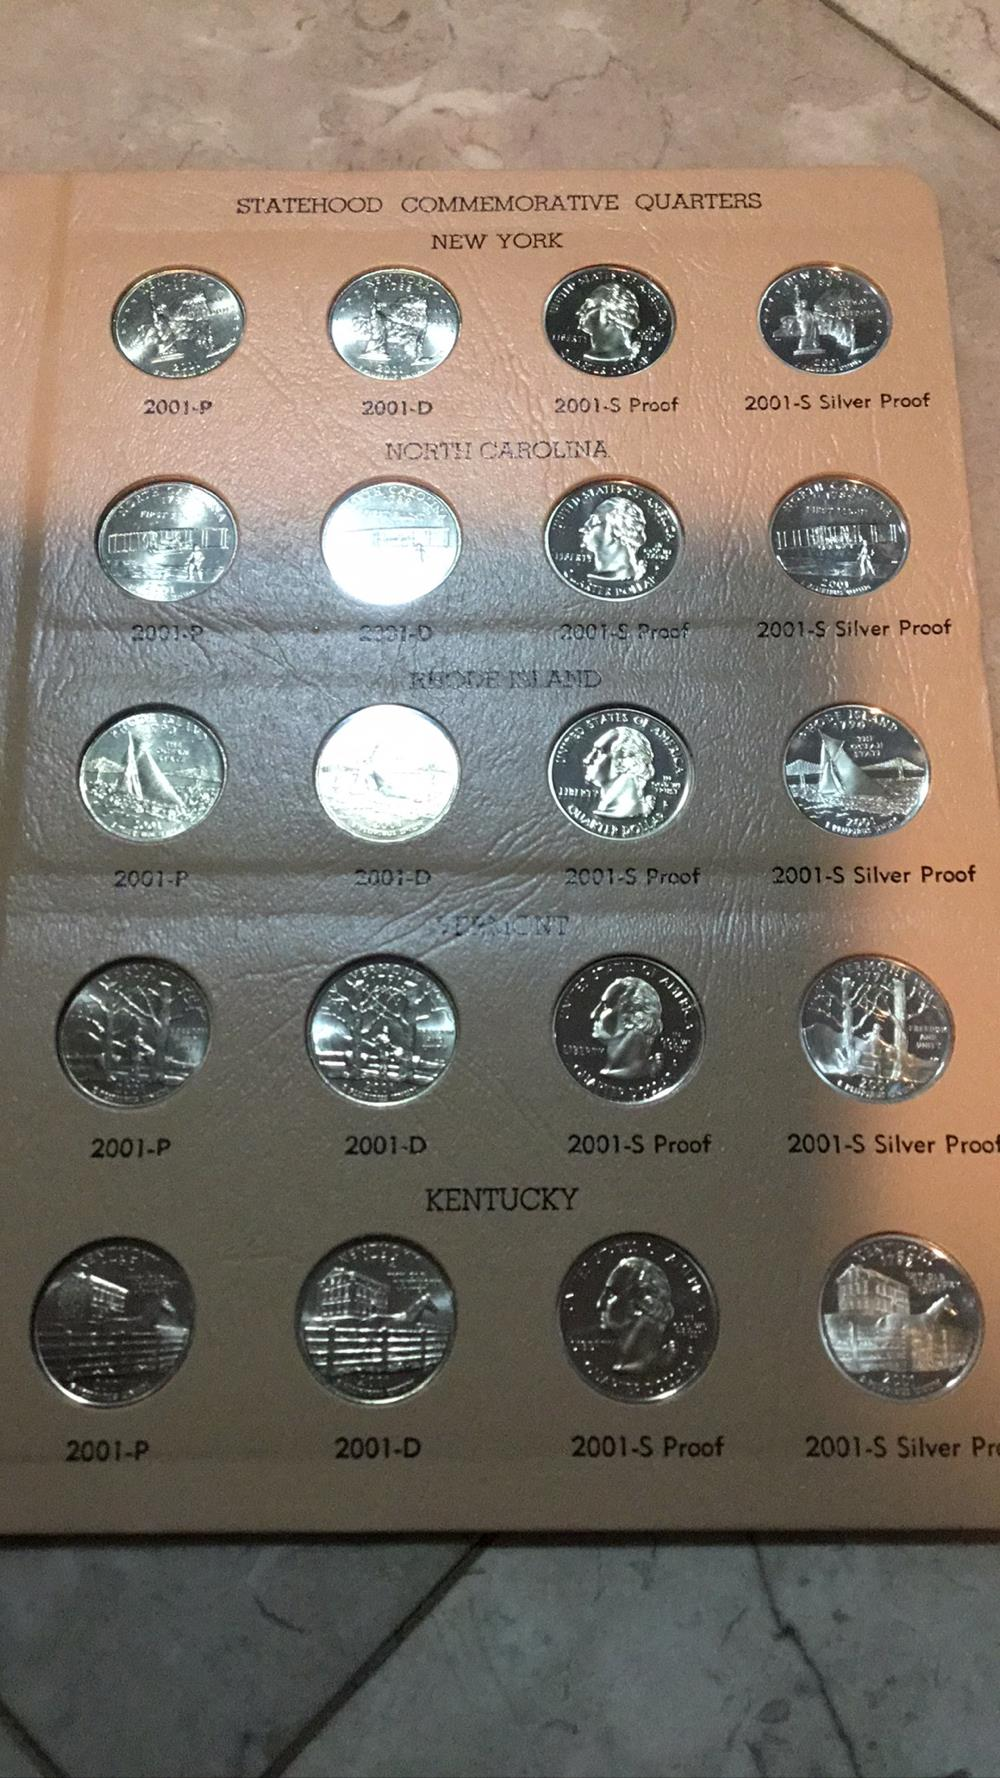 Lot 181: Statehood commemorative quarters sheet